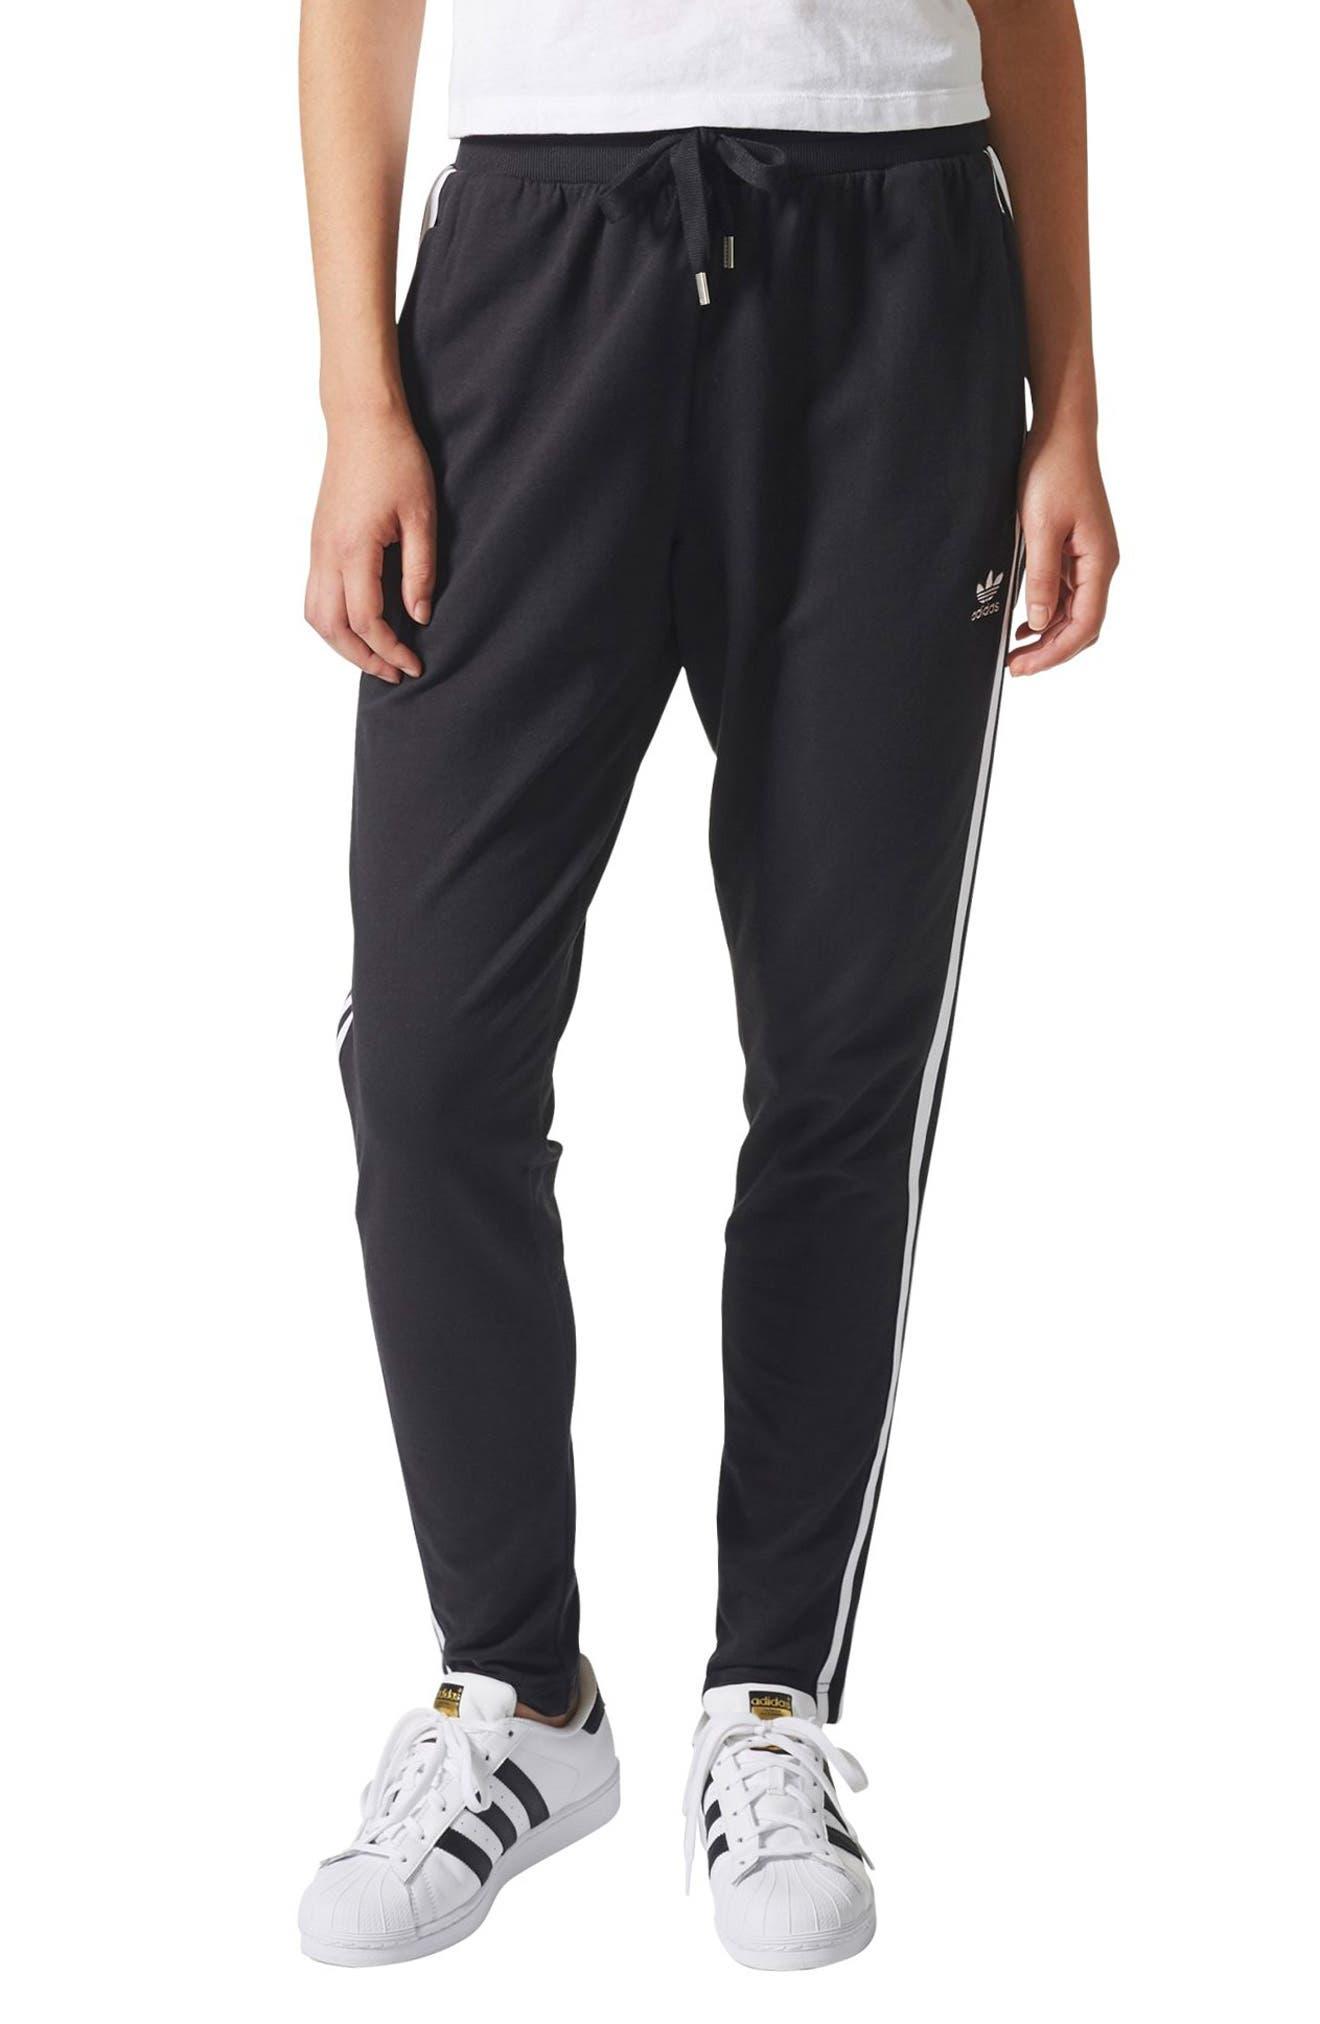 Main Image - adidas 3-Stripes Tapered Pants